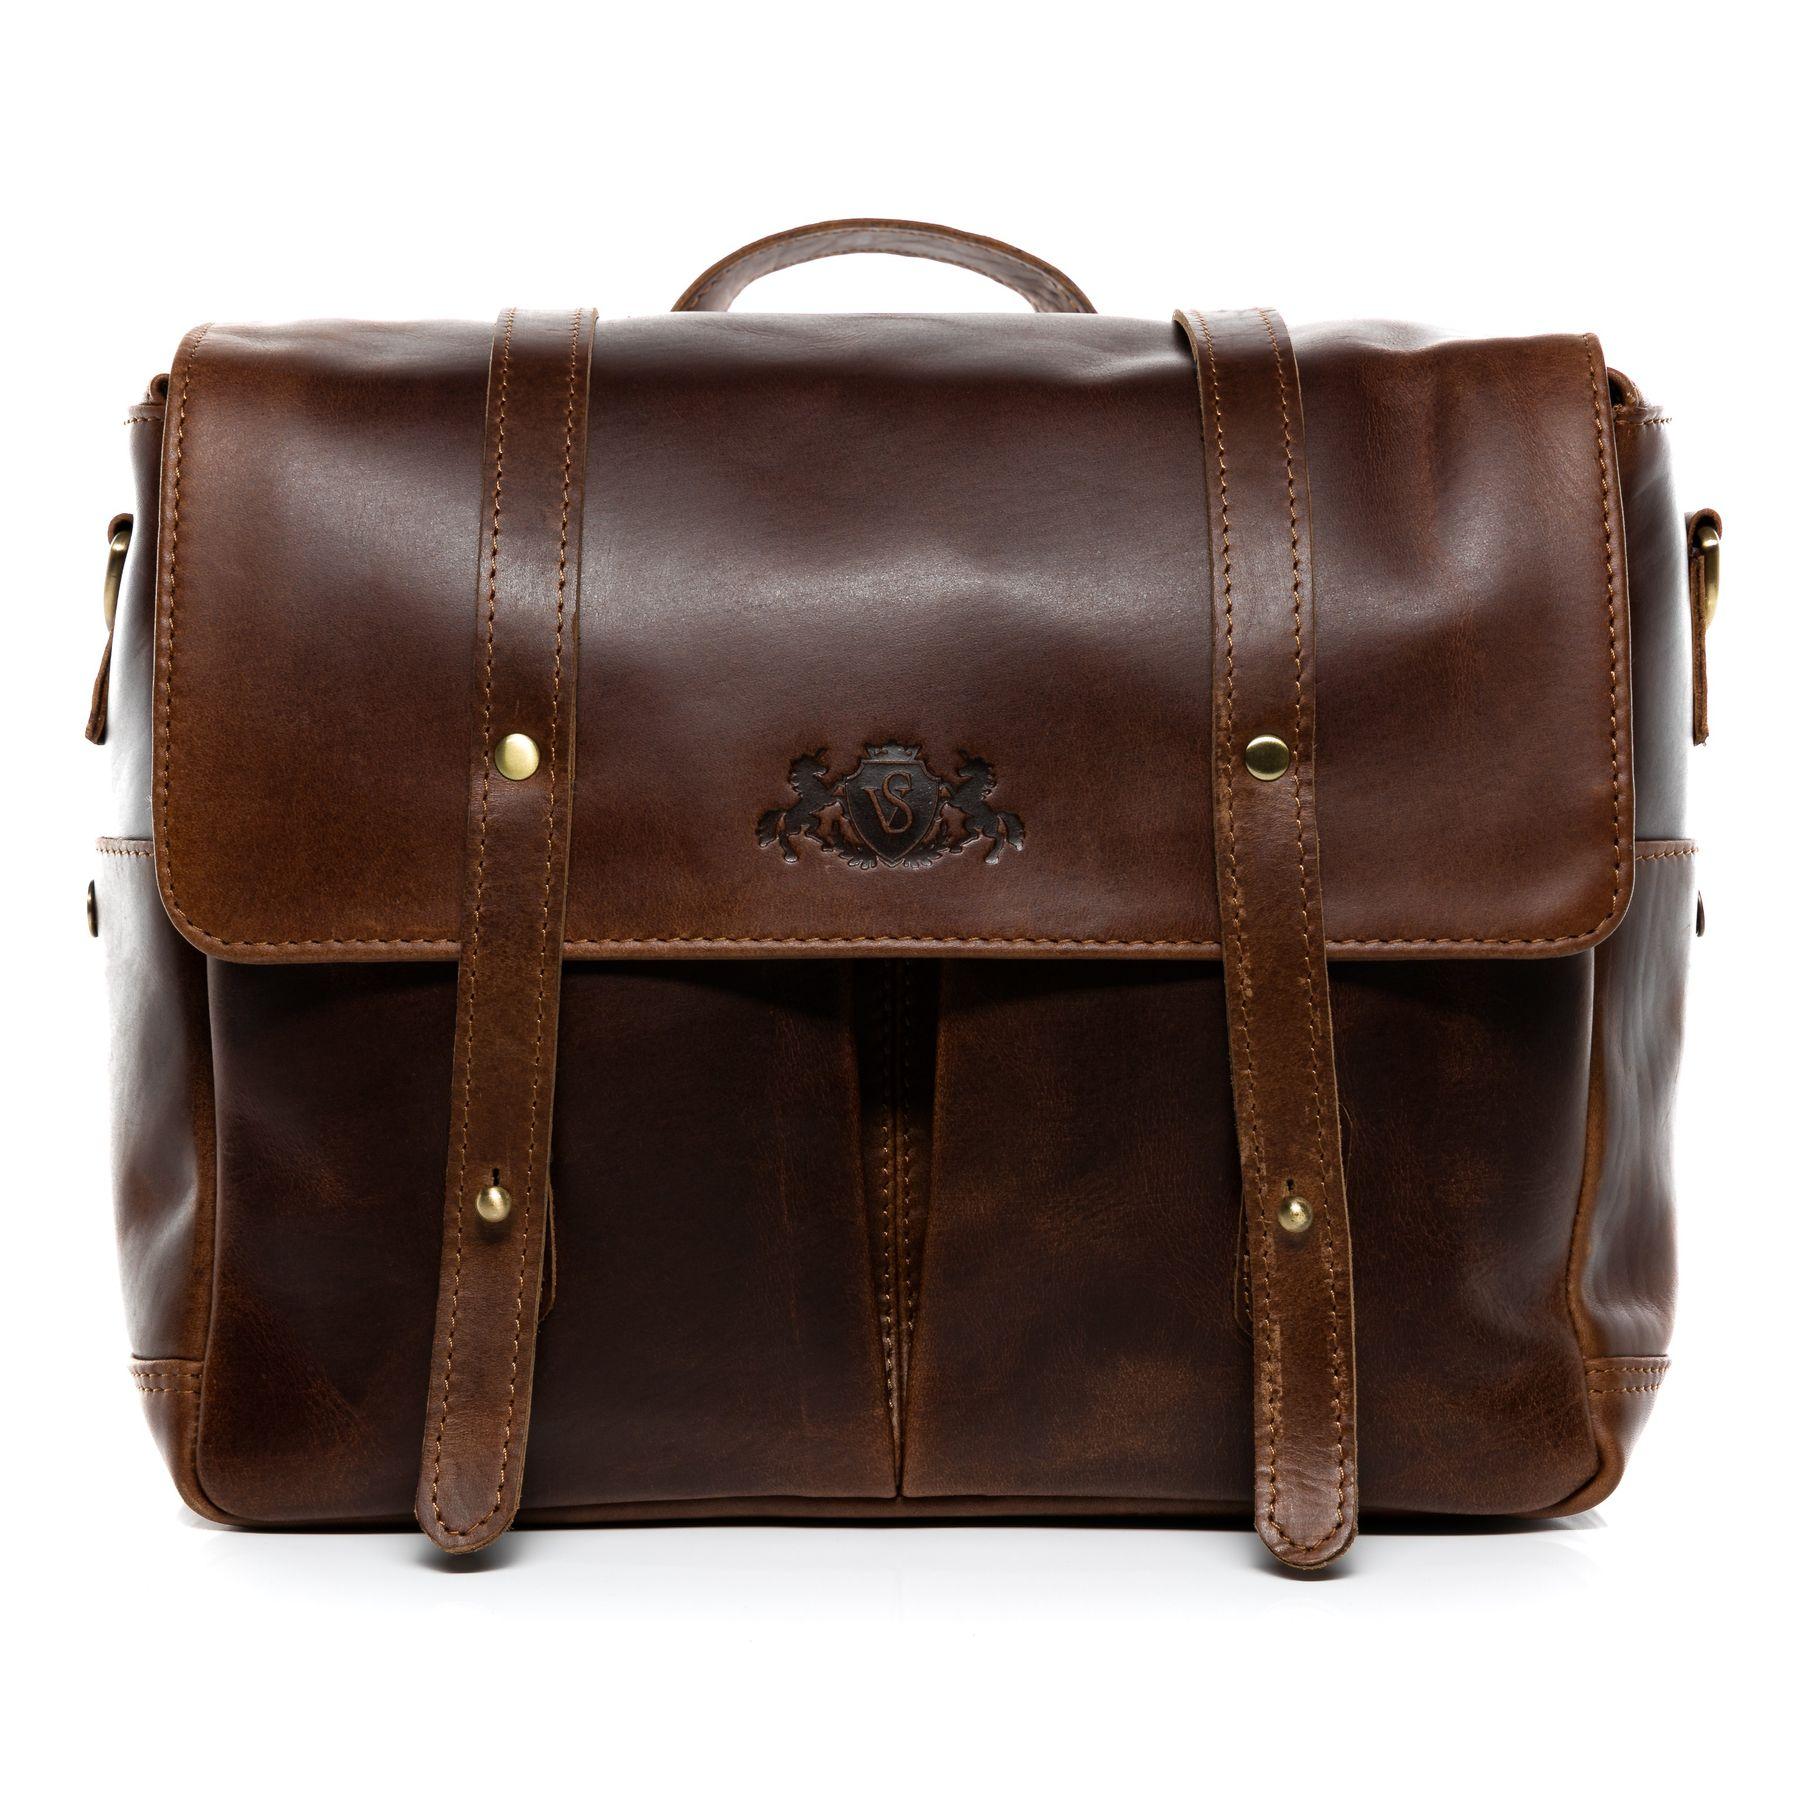 SID   VAIN camera bag DSLR - SLR Natural Leather HEATHROW brown-cognac camera  case with adjustable interior compartments messenger bag shoulder bag ... b957f7811629a